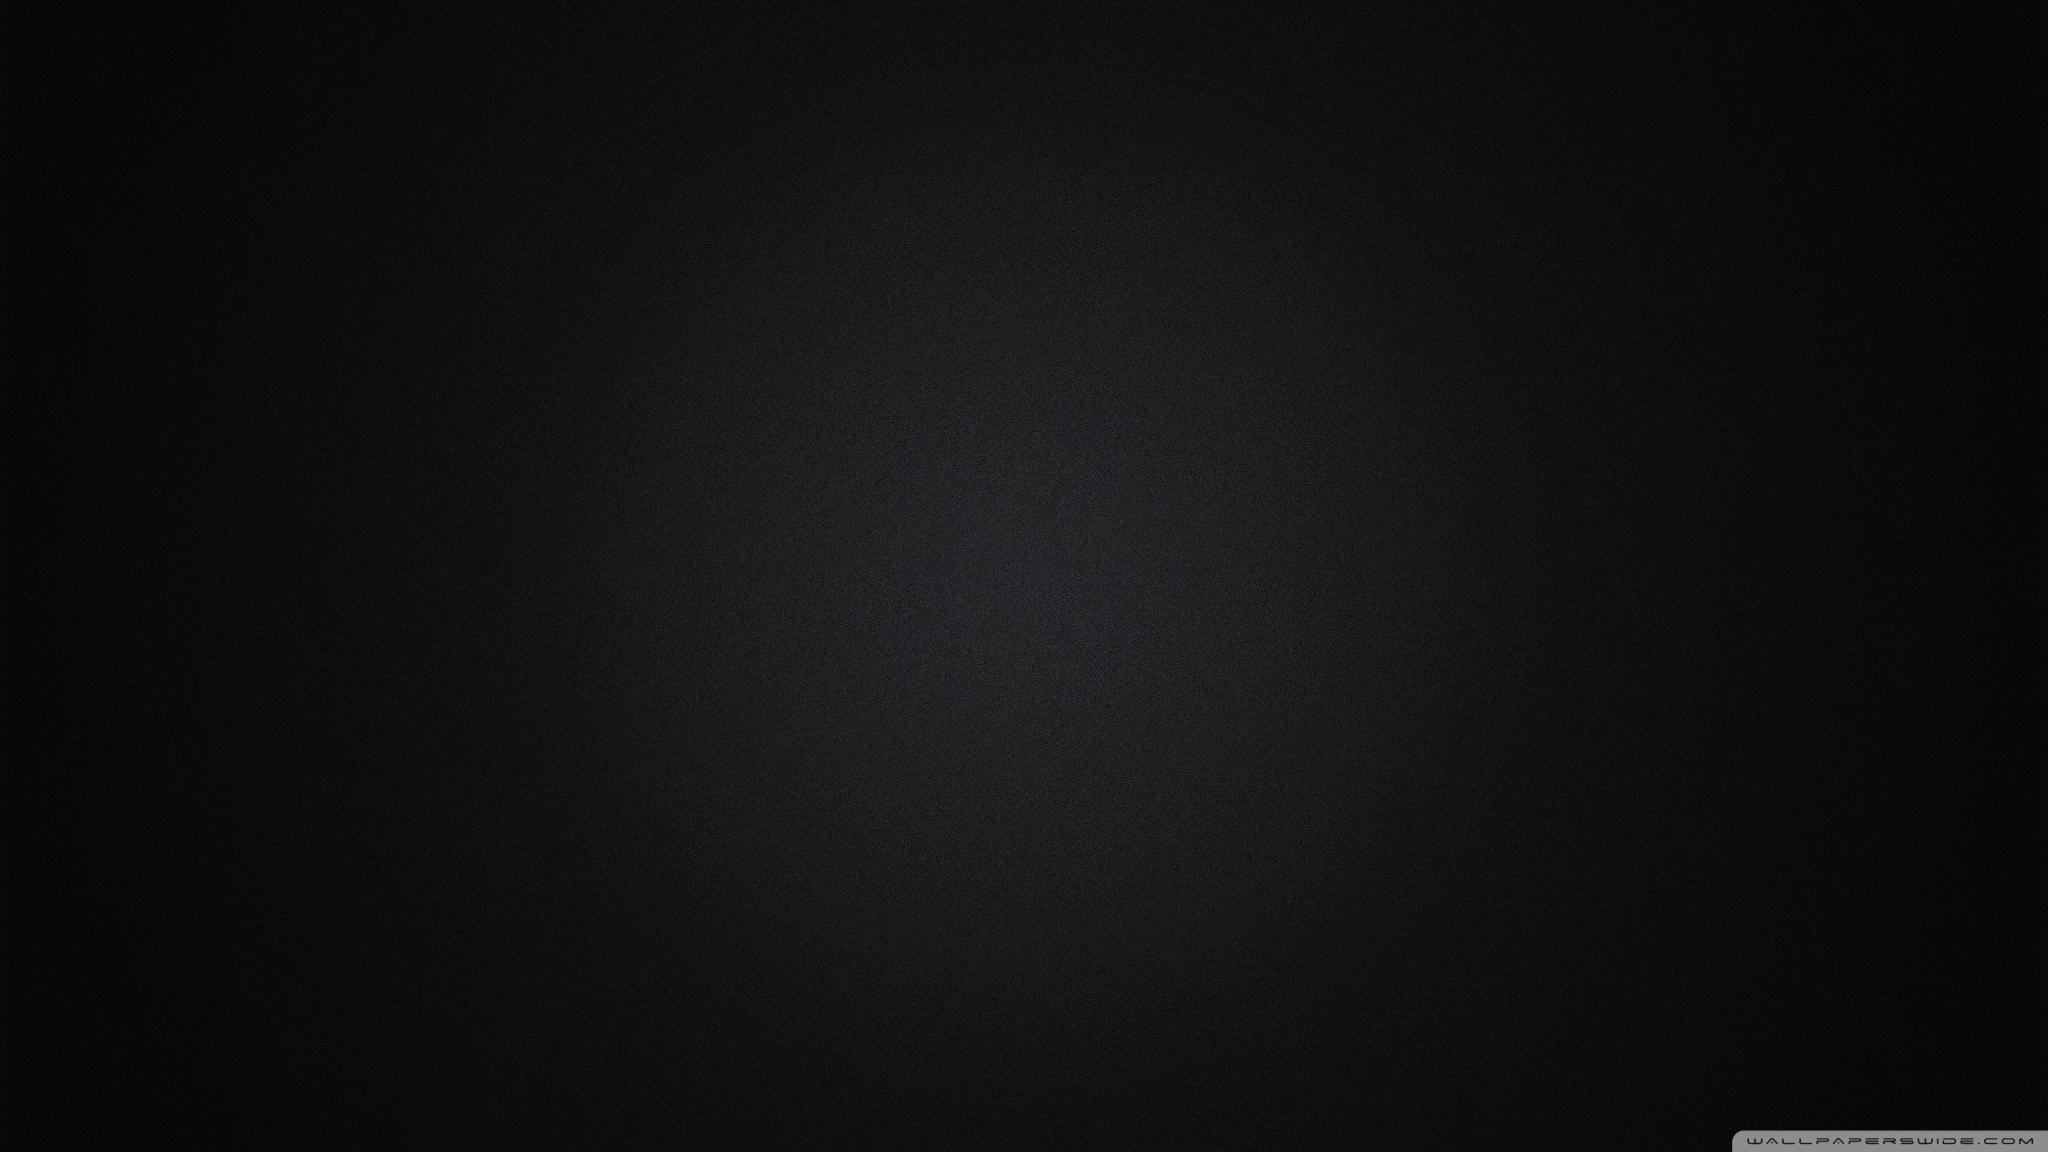 2048x1152 149 black background fabric wallpaperjpg 2048x1152